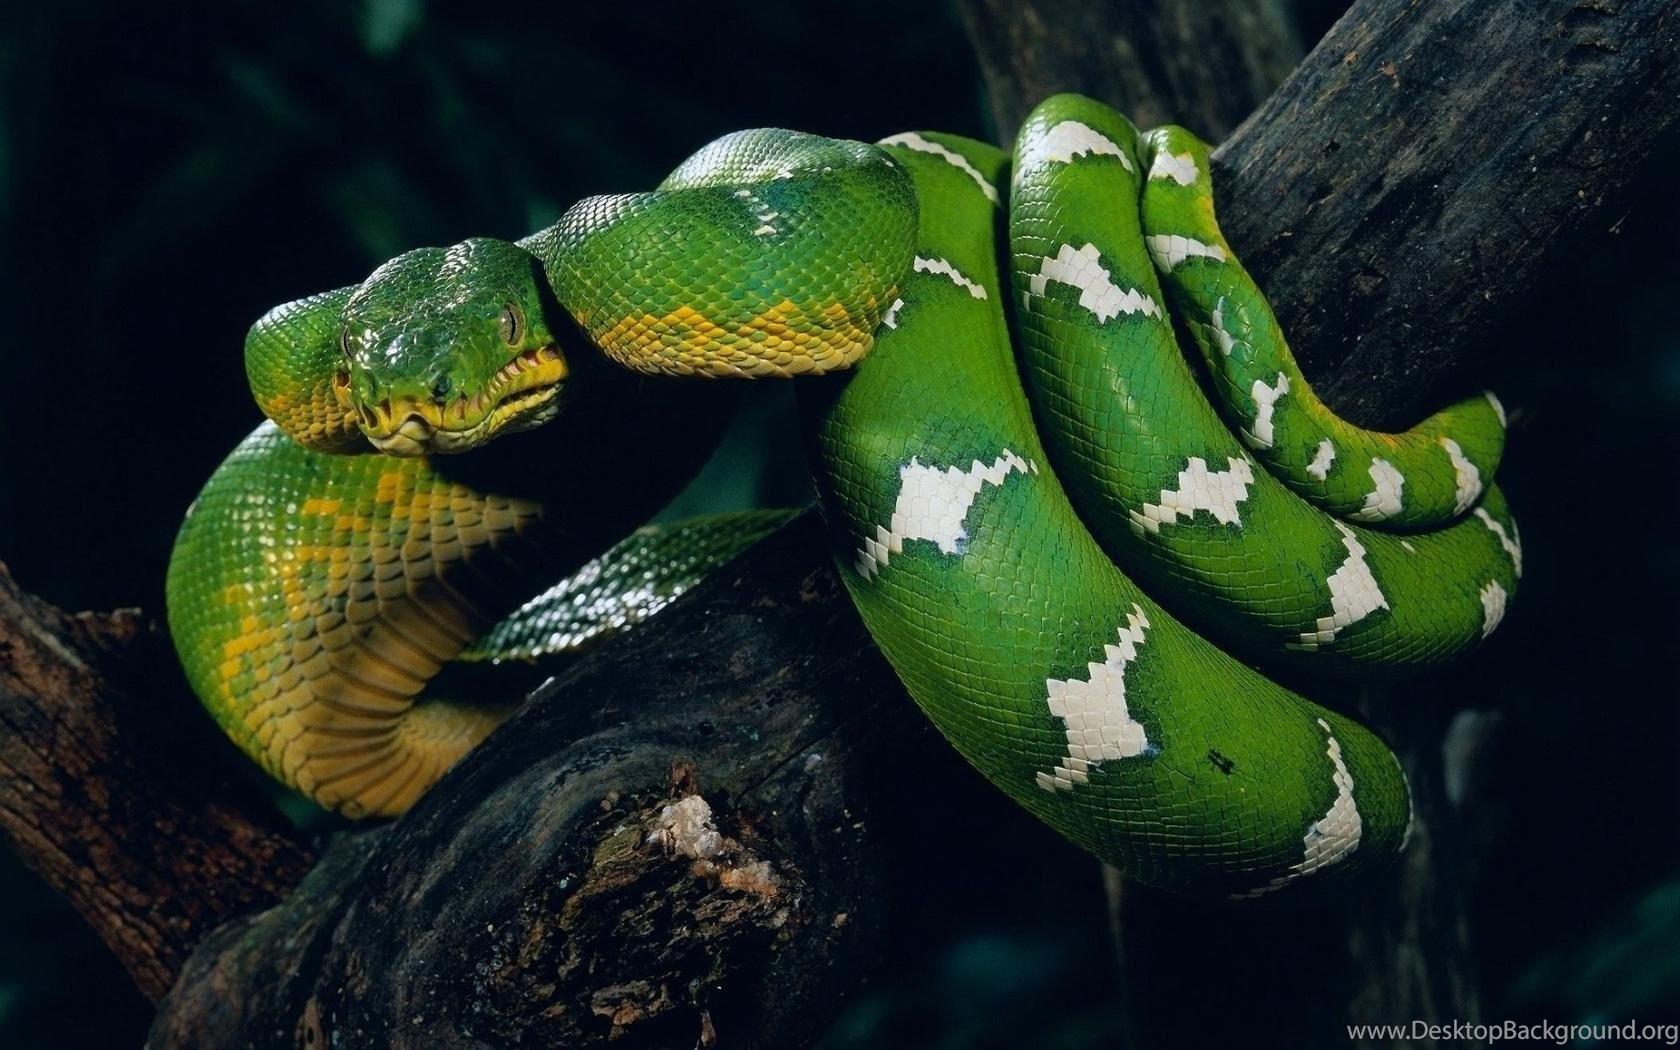 21 snake anaconda hd wallpapers free download green snake - Green snake hd wallpaper ...